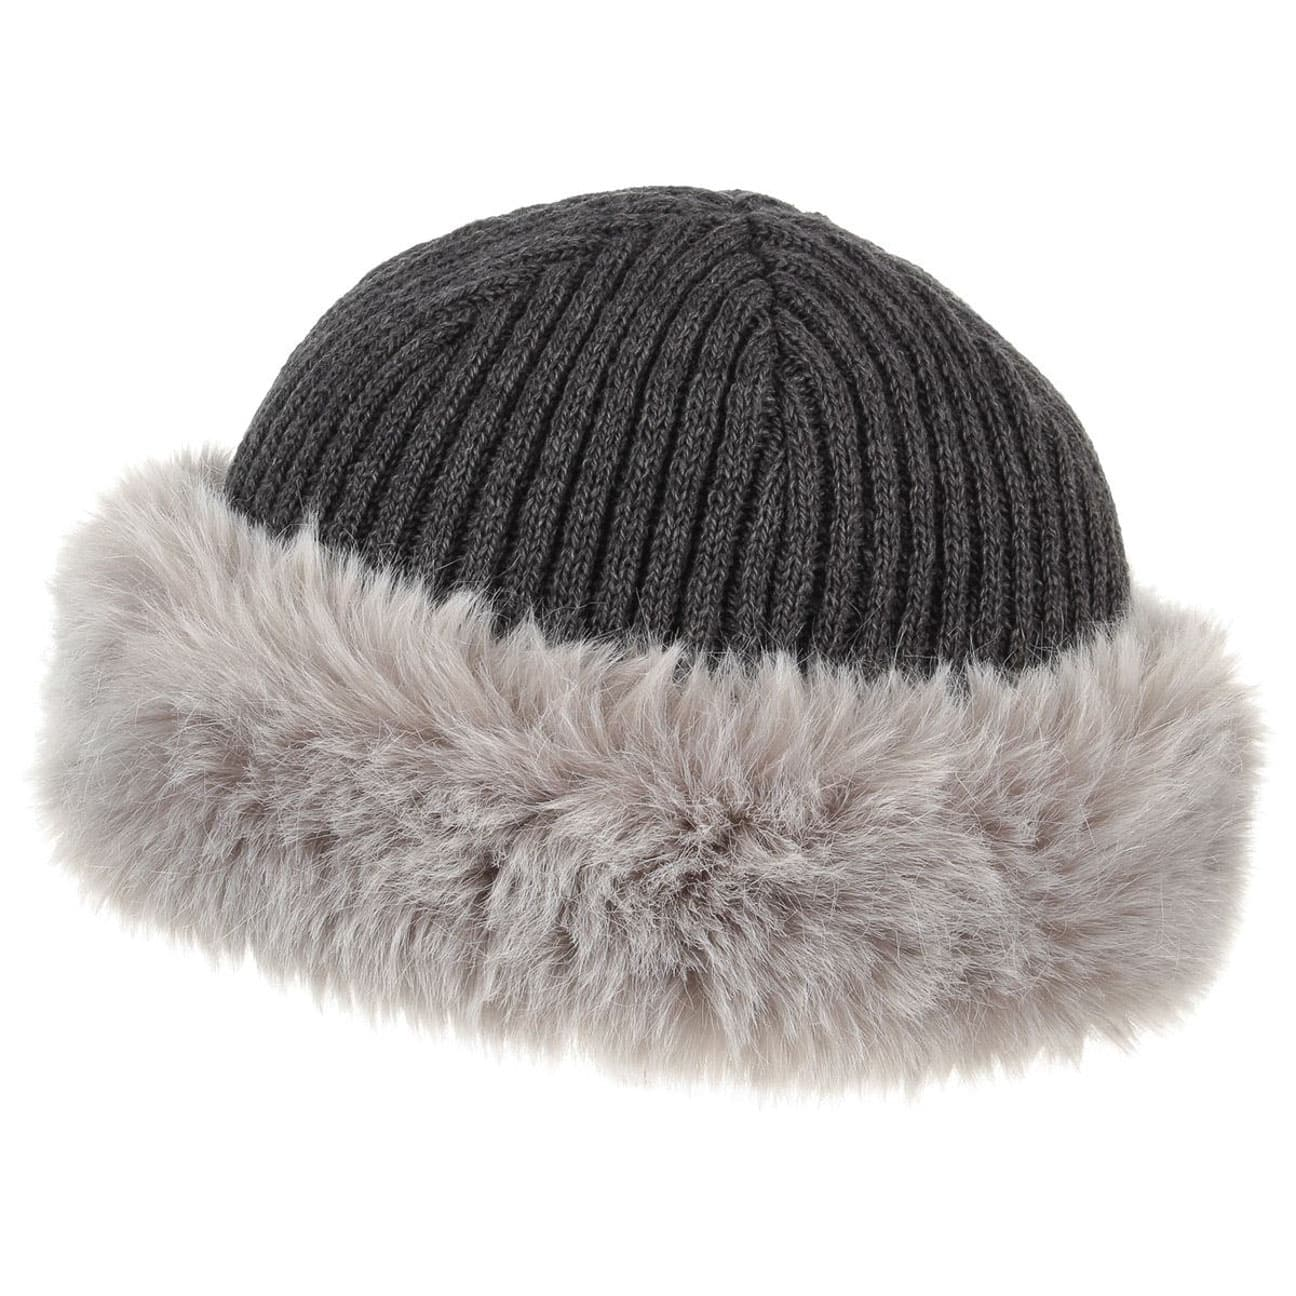 faux fur brim 180 s hat by gebeana gbp 45 95 gt hats